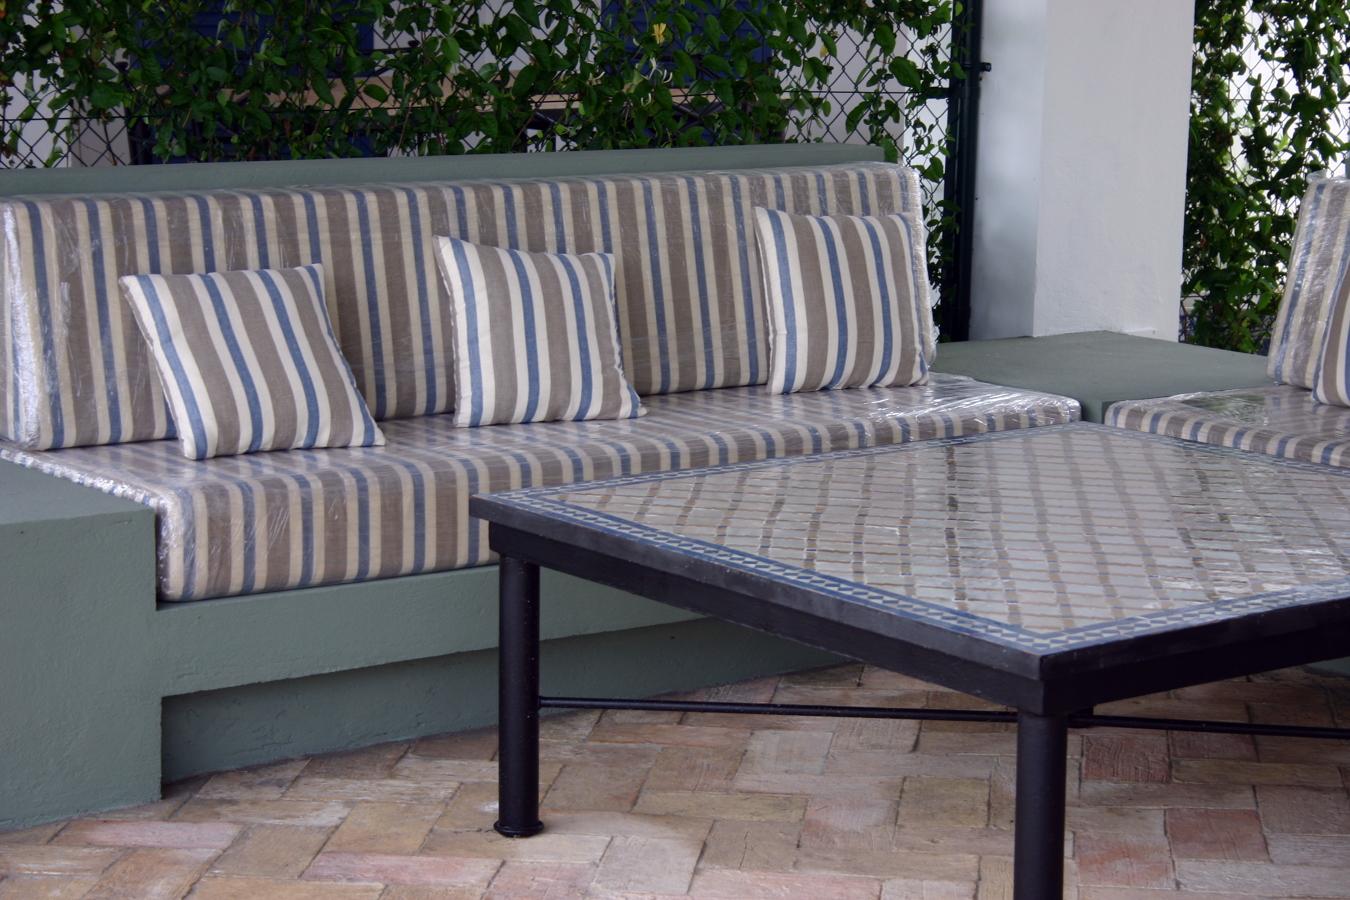 Foto cojines terraza de tapicecor 322332 habitissimo - Cojines para terrazas ...